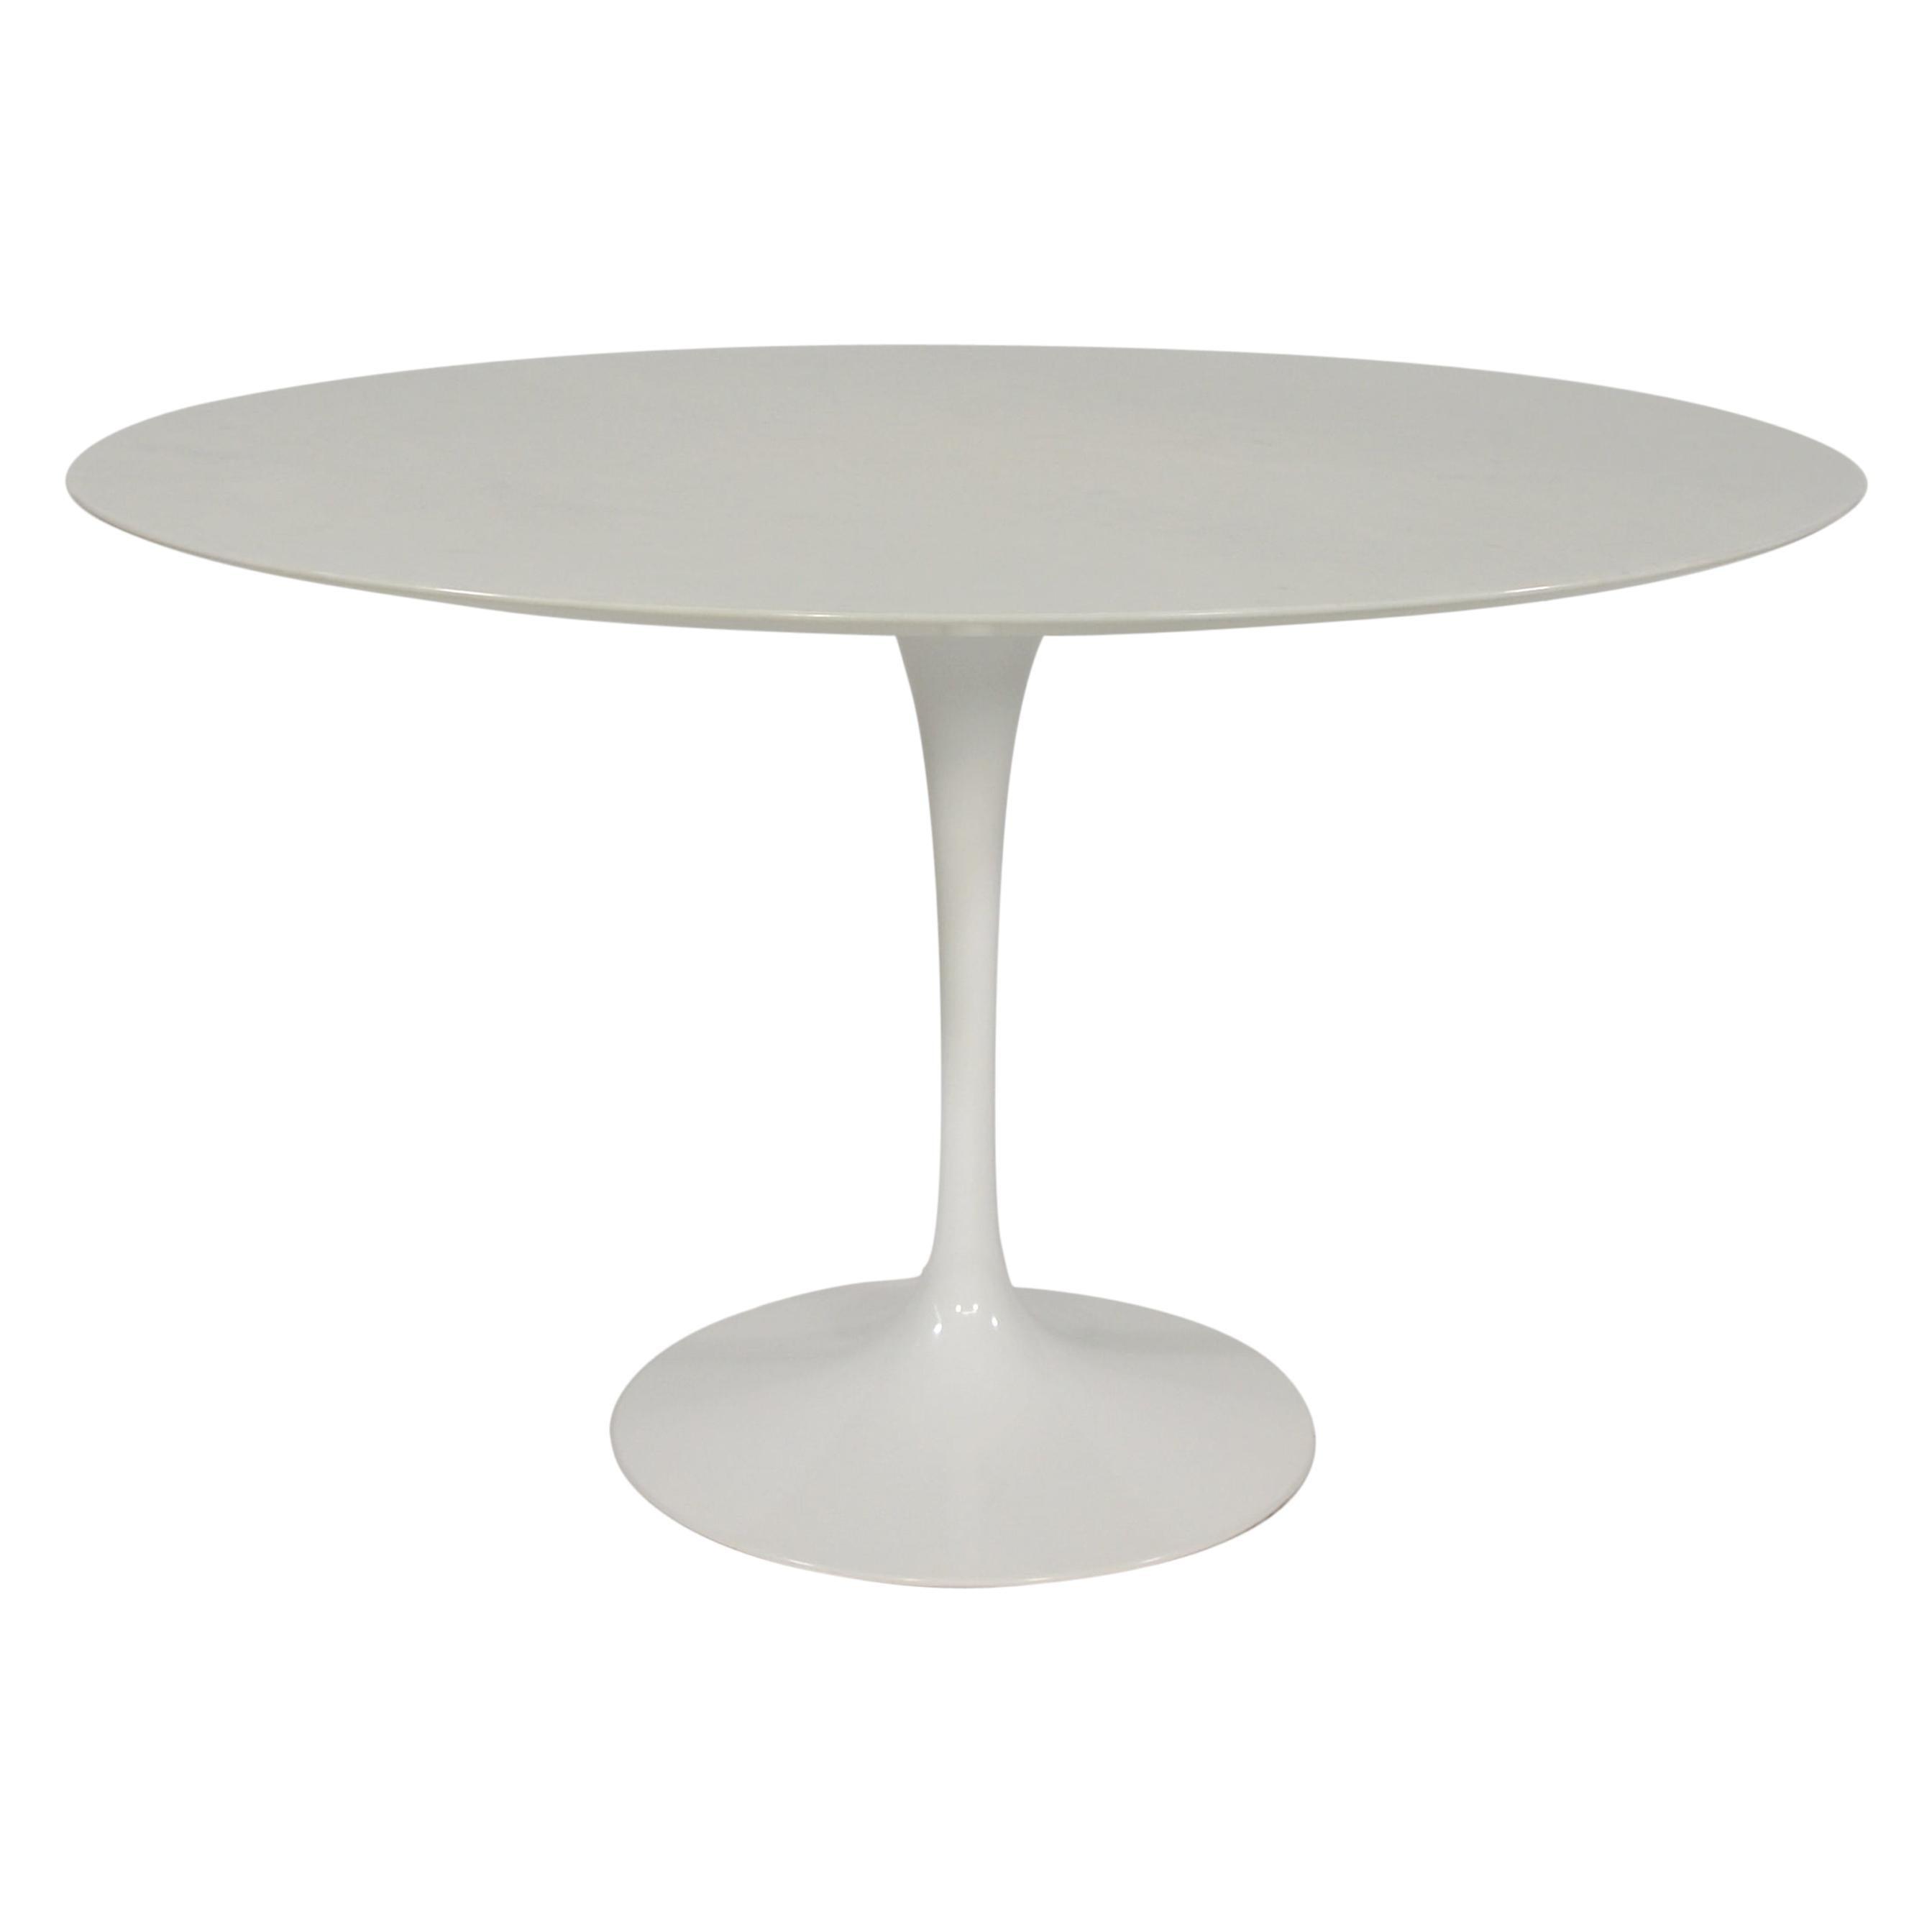 Eero Saarinen for Knoll White Marble Tulip Dining Table